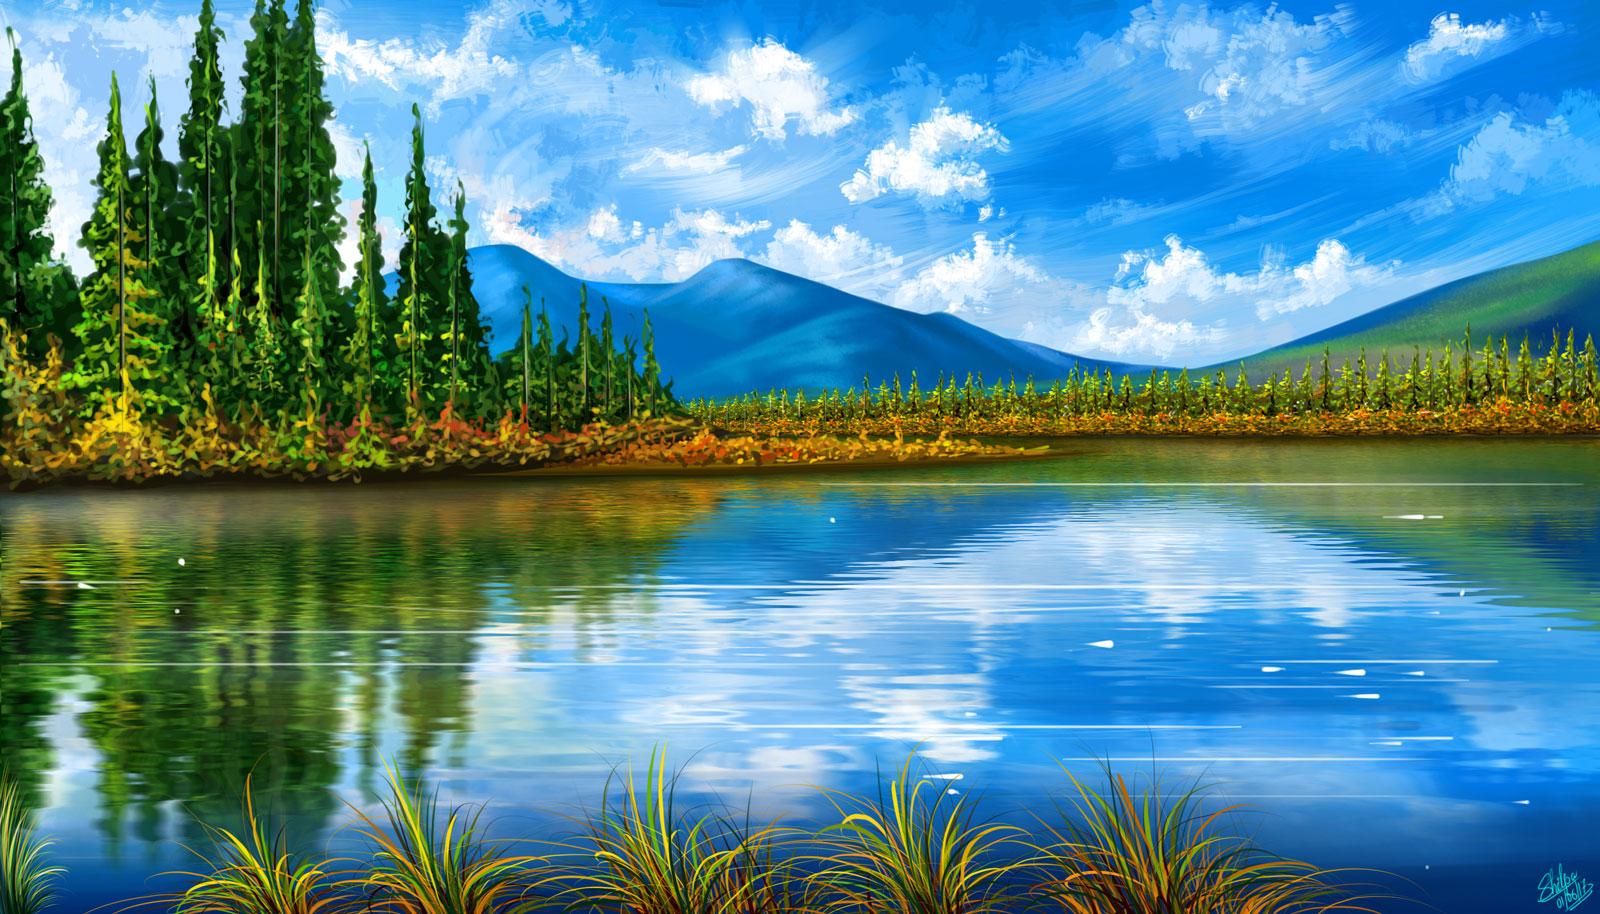 sky blue mountain reflection - photo #35